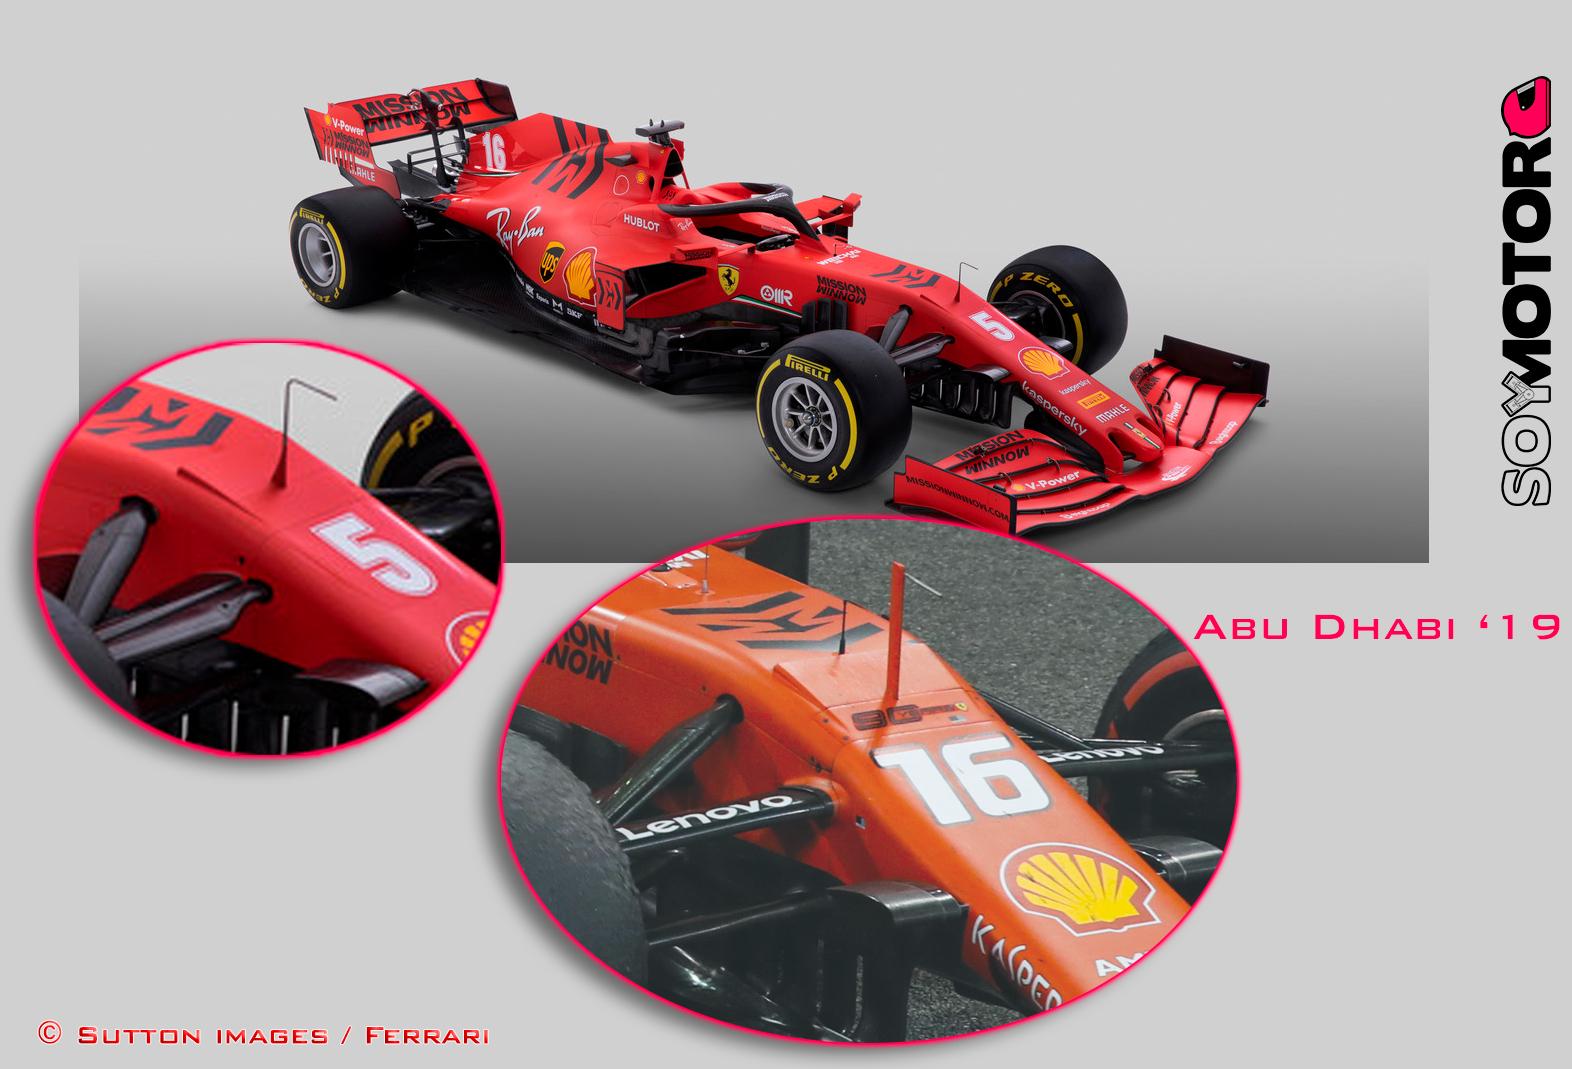 ferrari-sf1000-conducto-s-soymotor.jpg